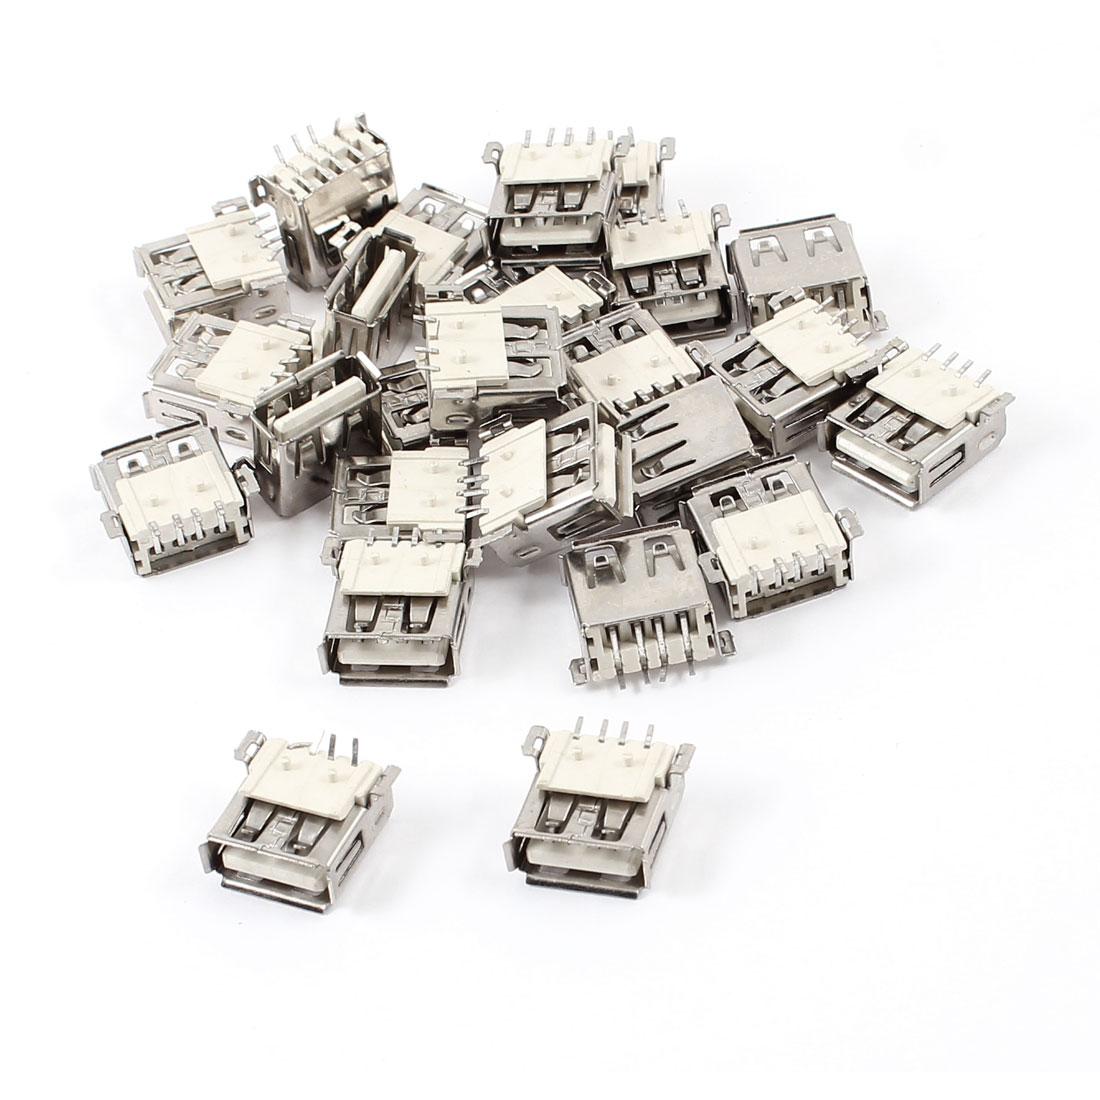 25 Pcs USB Female Type A Port SMT 4-Pin 90 Degree Jack Socket Connector